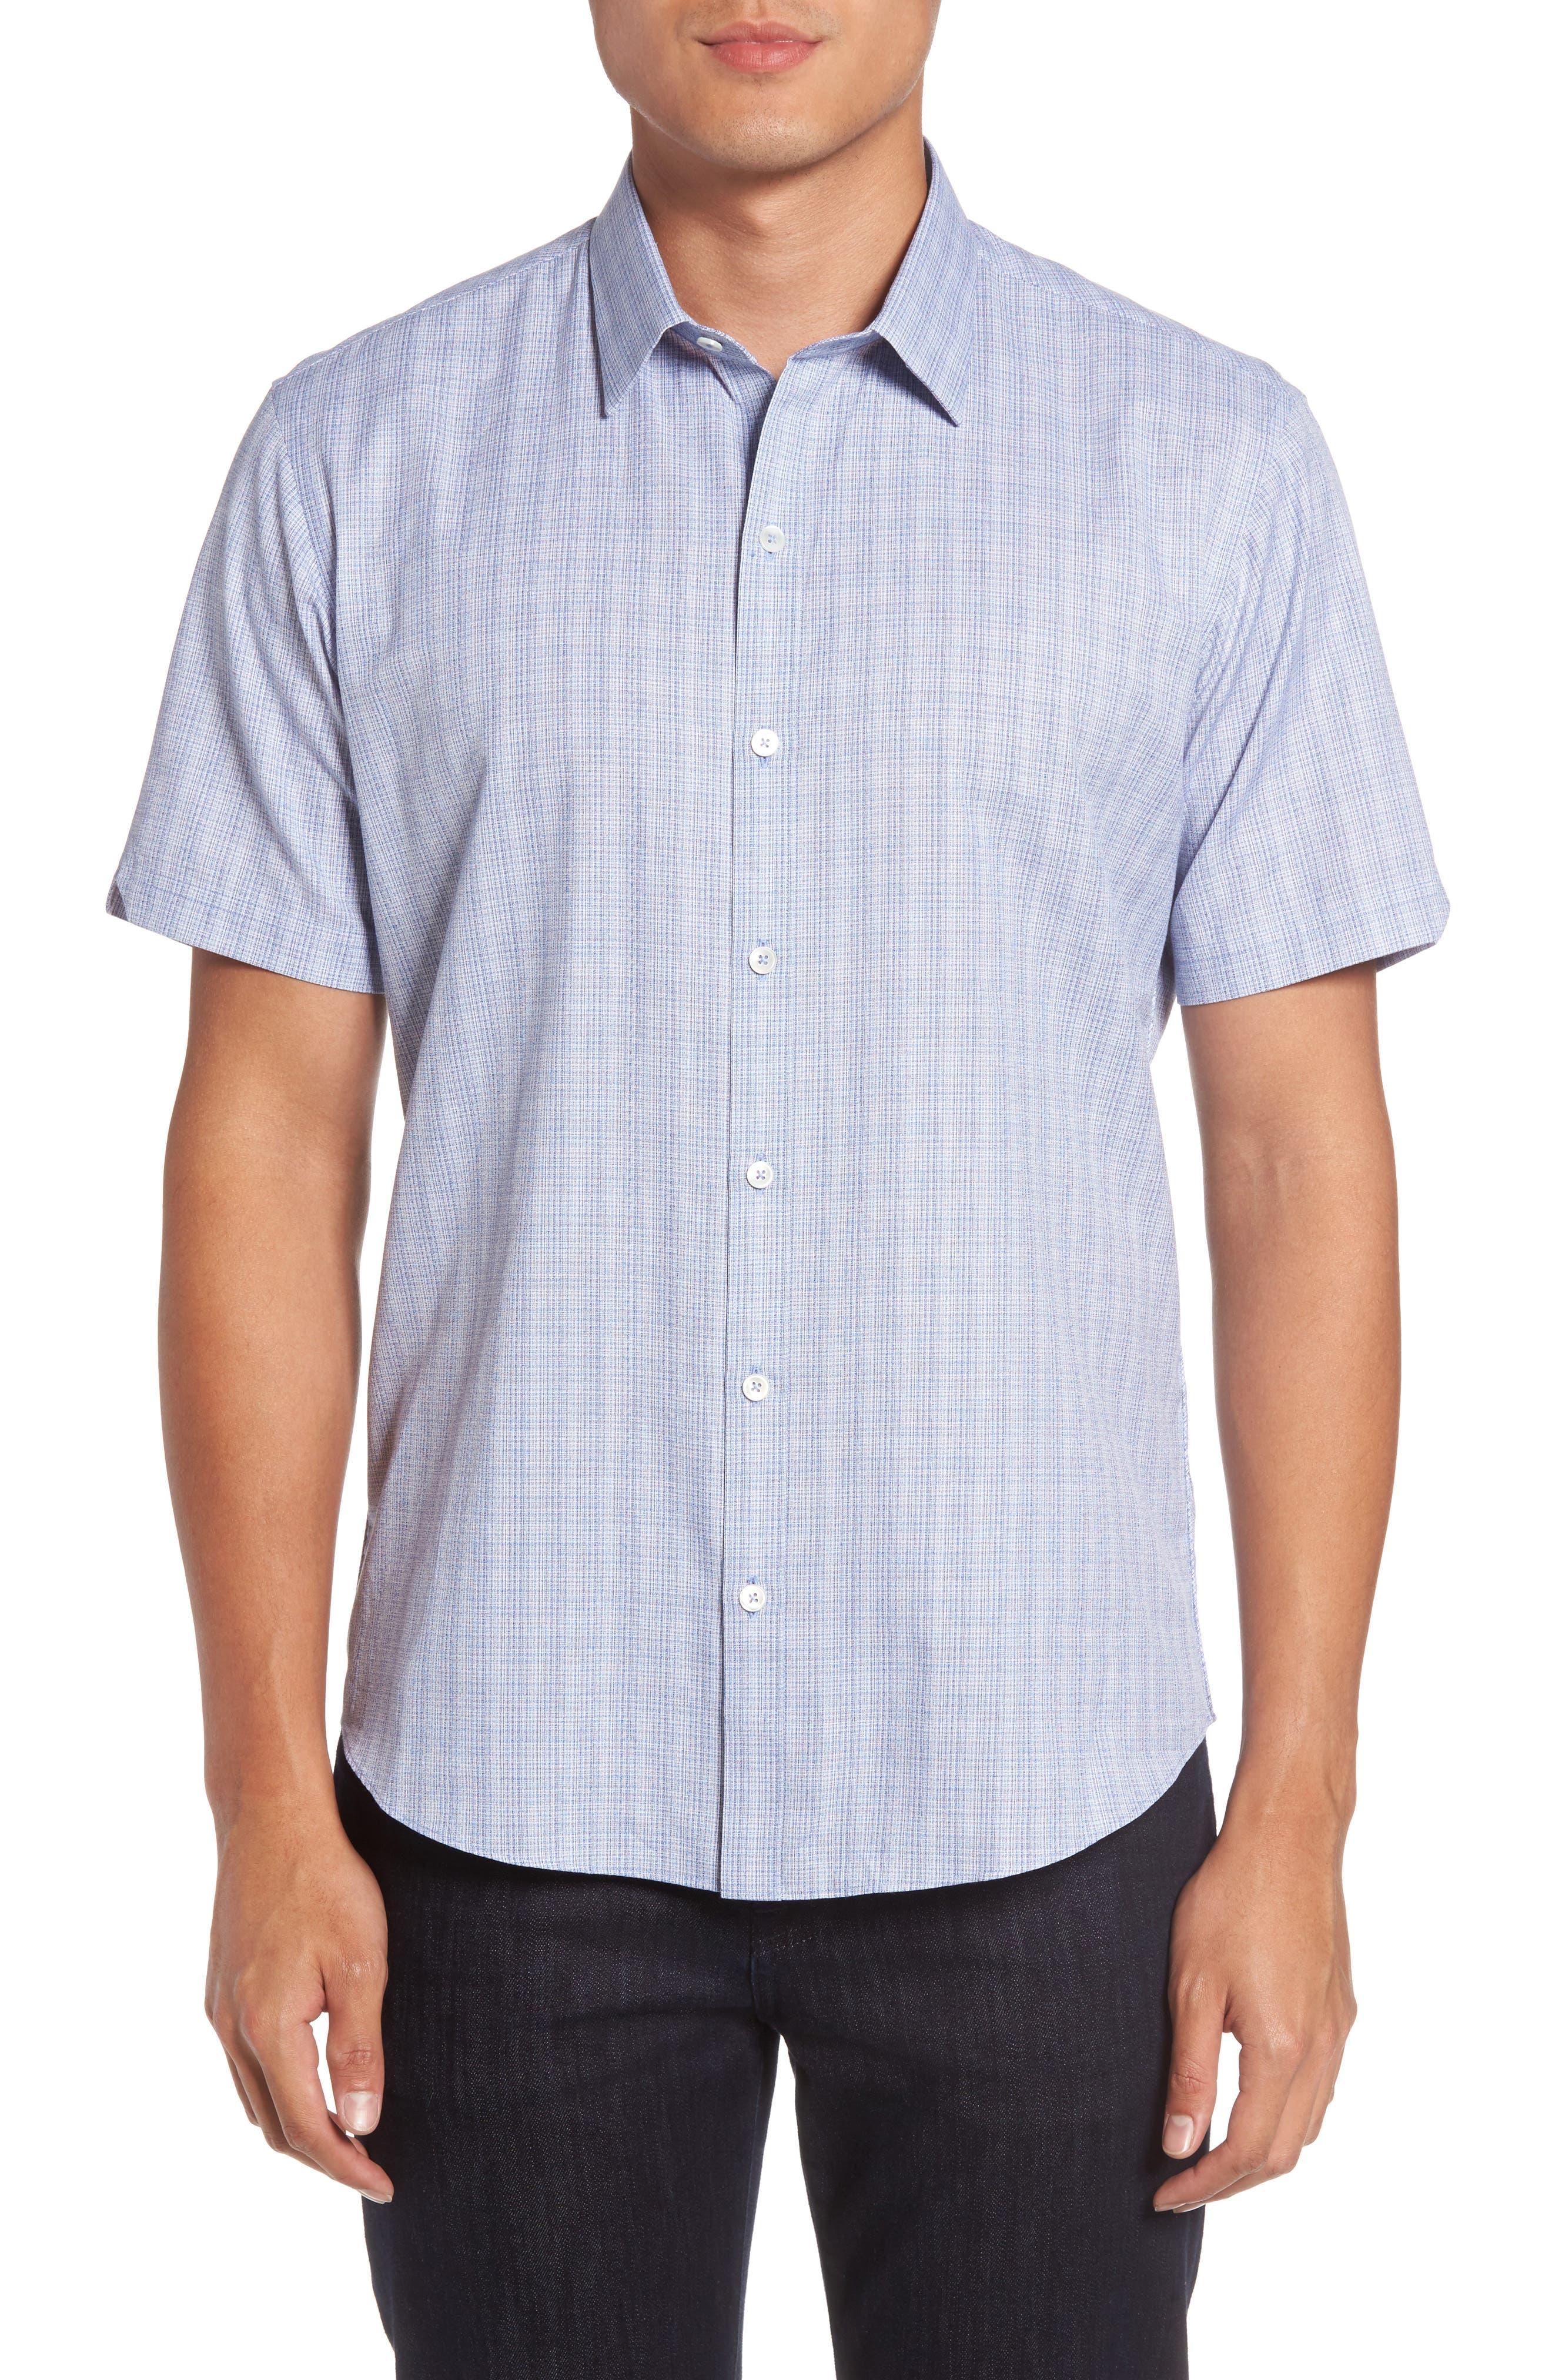 Main Image - Zachary Prell Zimmerman Check Sport Shirt